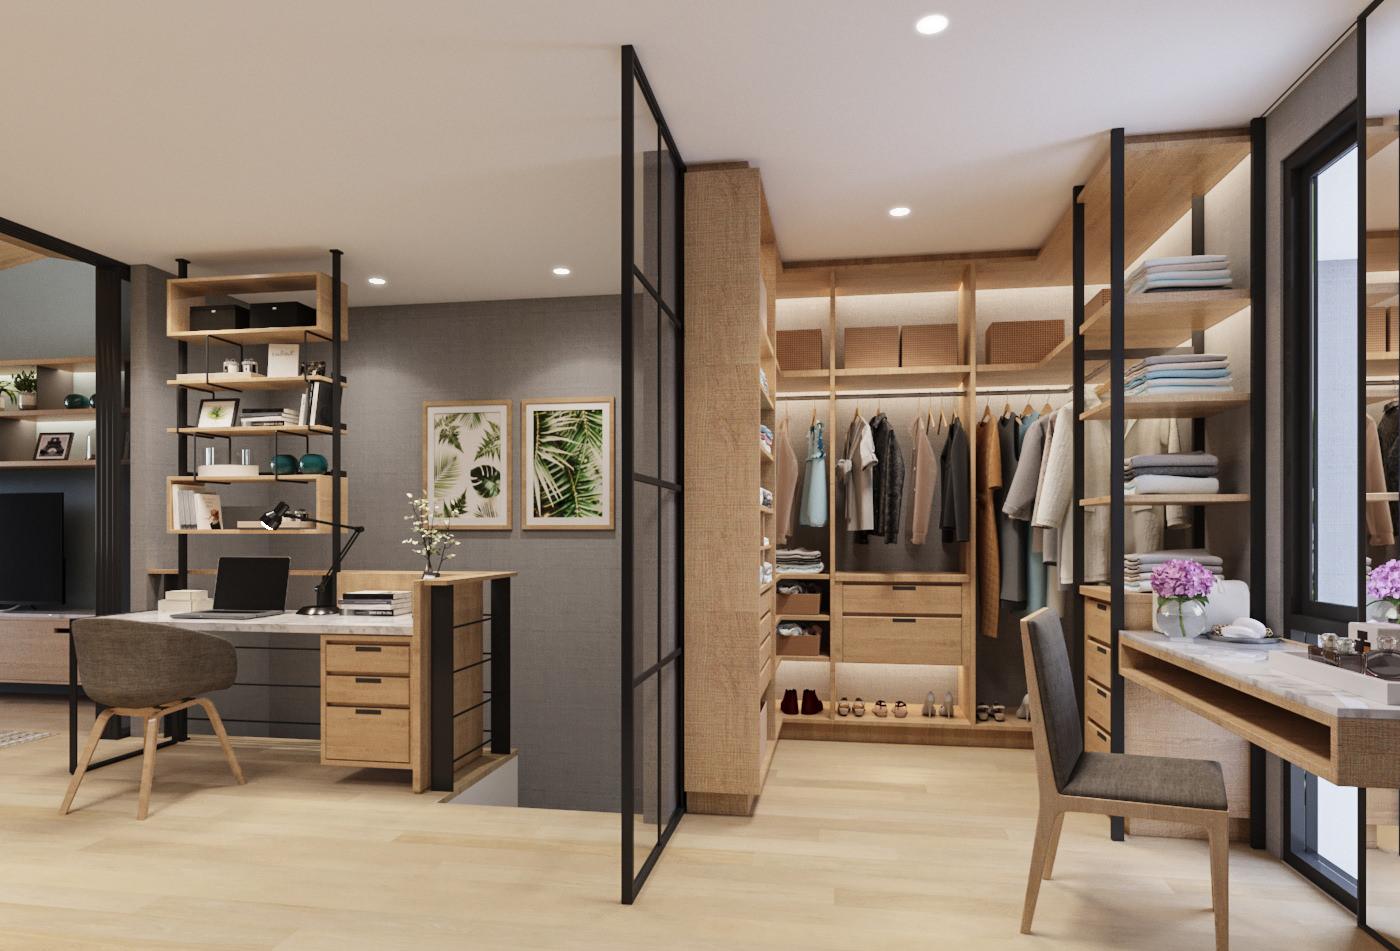 Interior-WalkInCloset